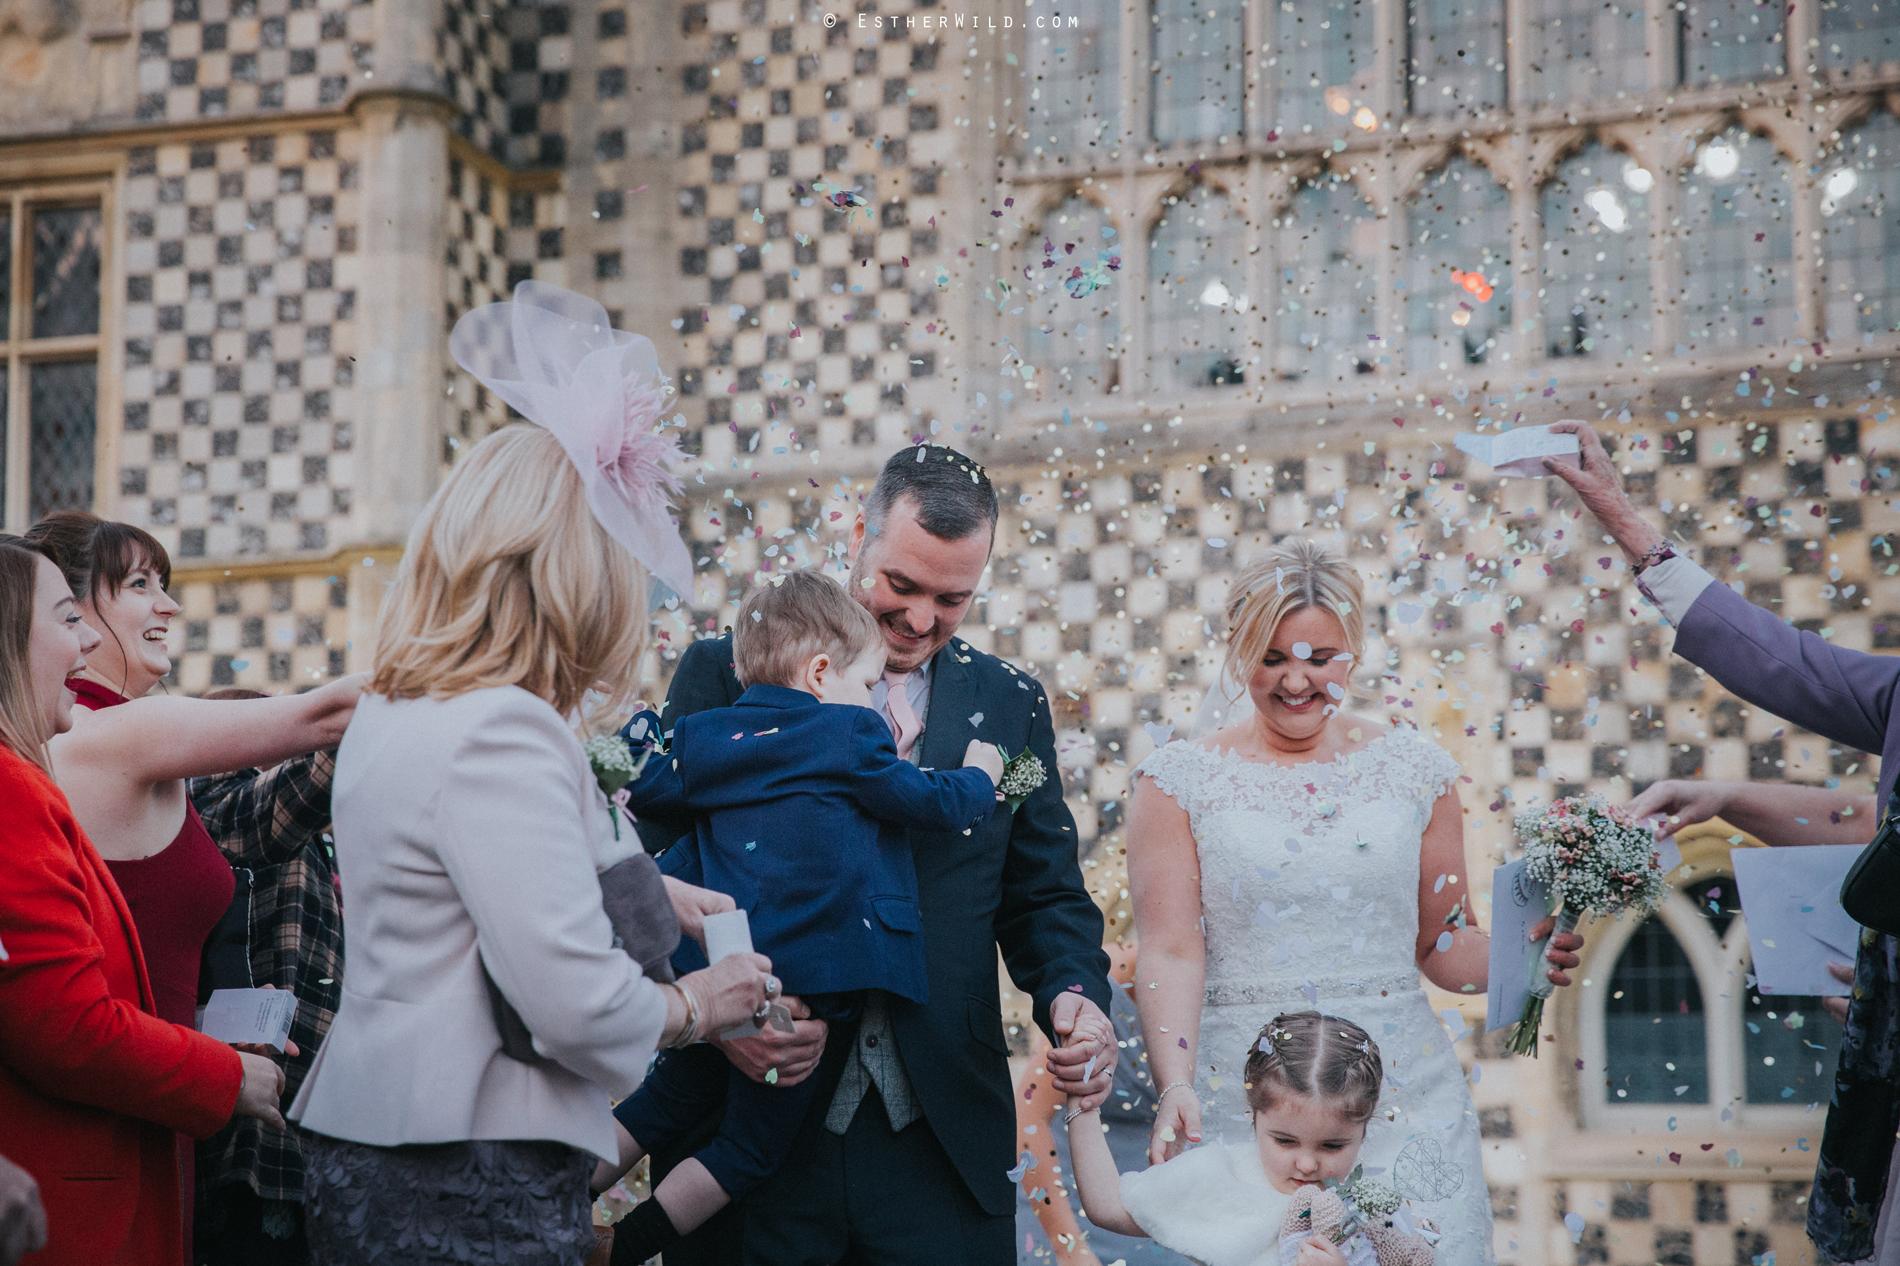 Wedding_Kings_Lynn_Town_Hall_Norfolk_Photographer_Esther_Wild_IMG_1255.jpg